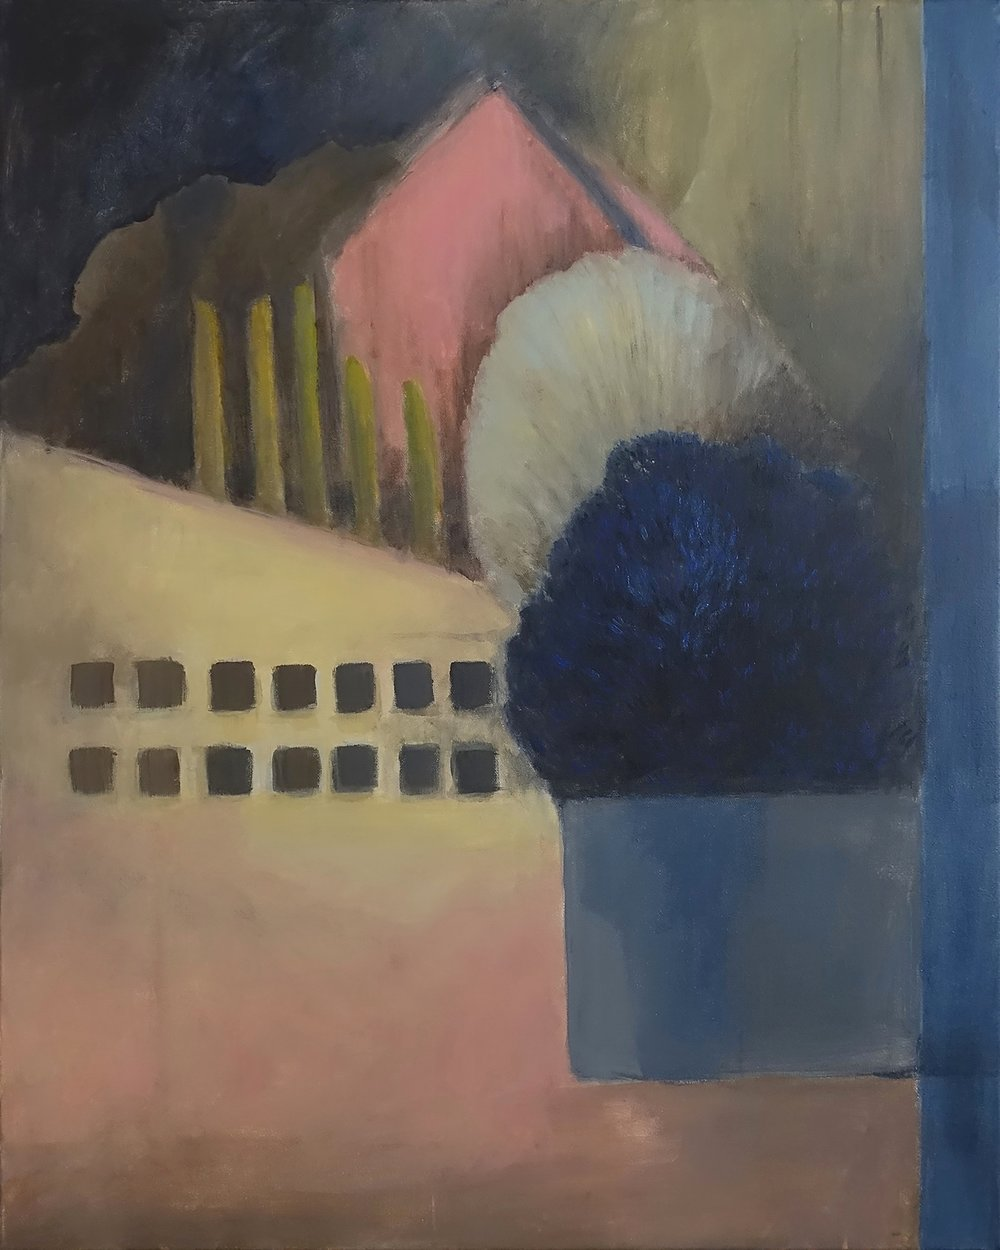 Untitled (Bush), 2018